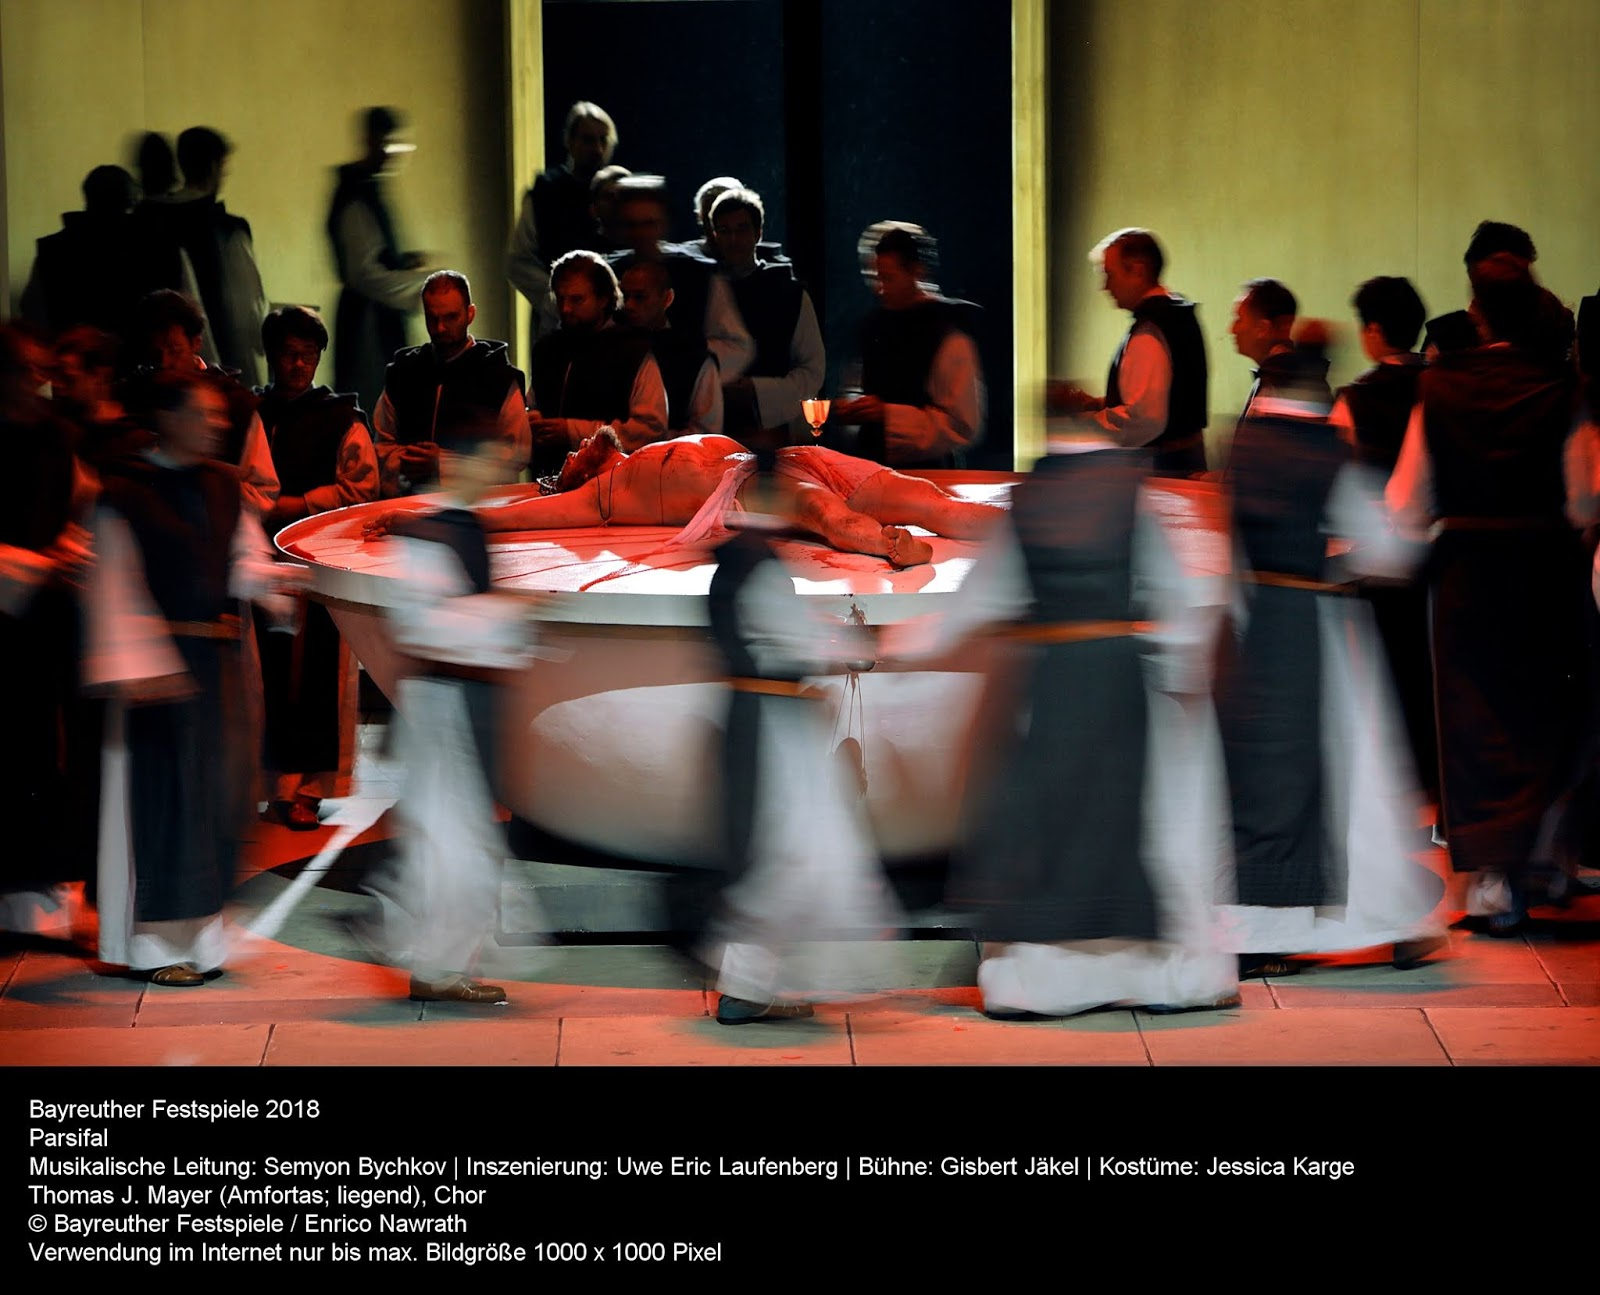 Bayreuth's Parsifal provided a sensitive portrayal of humanity overcoming adversity